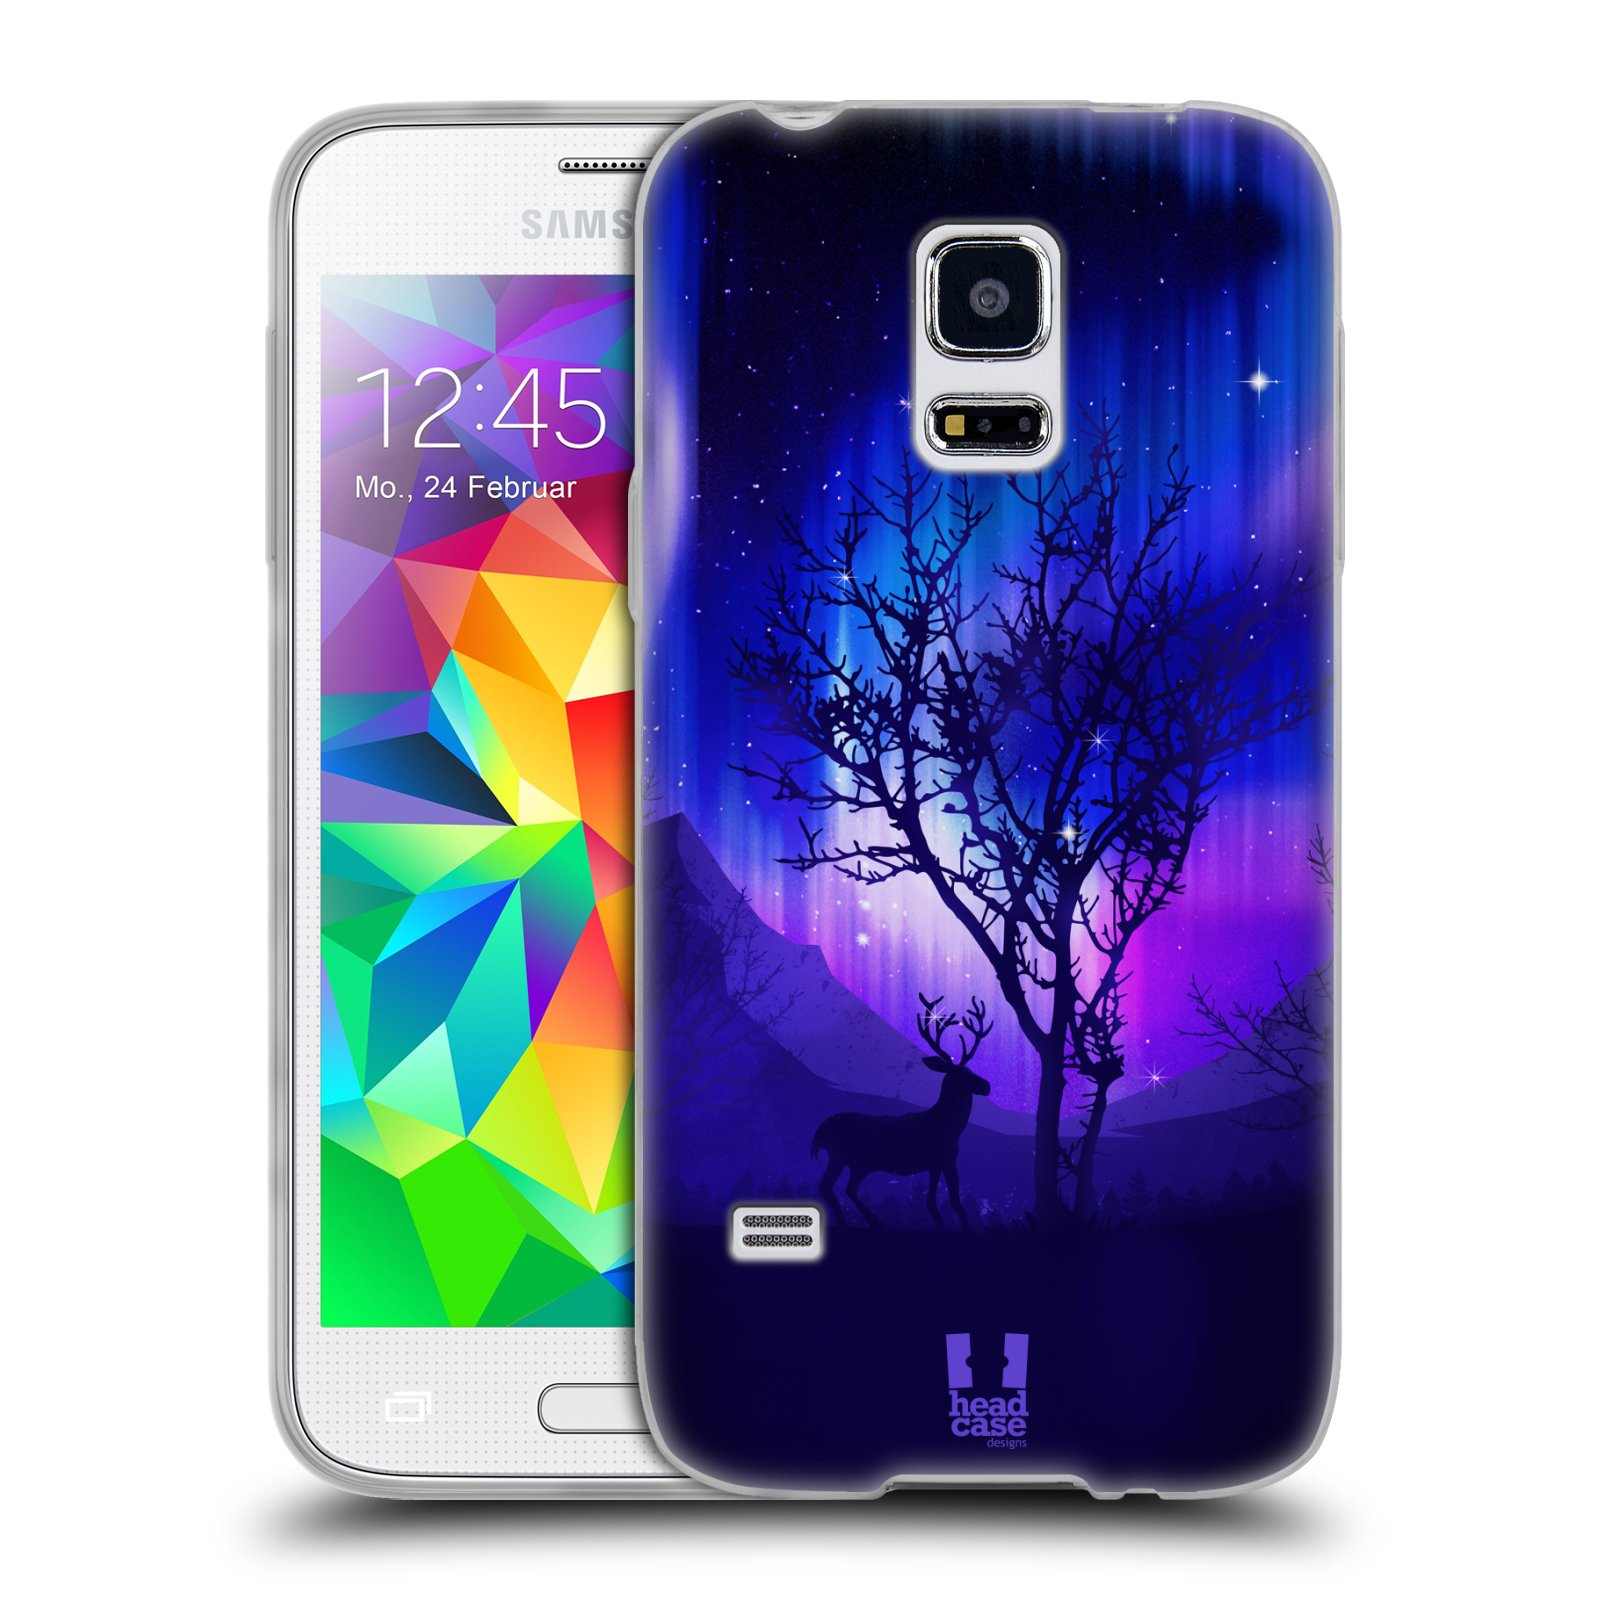 Silikonové pouzdro na mobil Samsung Galaxy S5 Mini HEAD CASE Polární Záře Strom (Silikonový kryt či obal na mobilní telefon Samsung Galaxy S5 Mini SM-G800F)